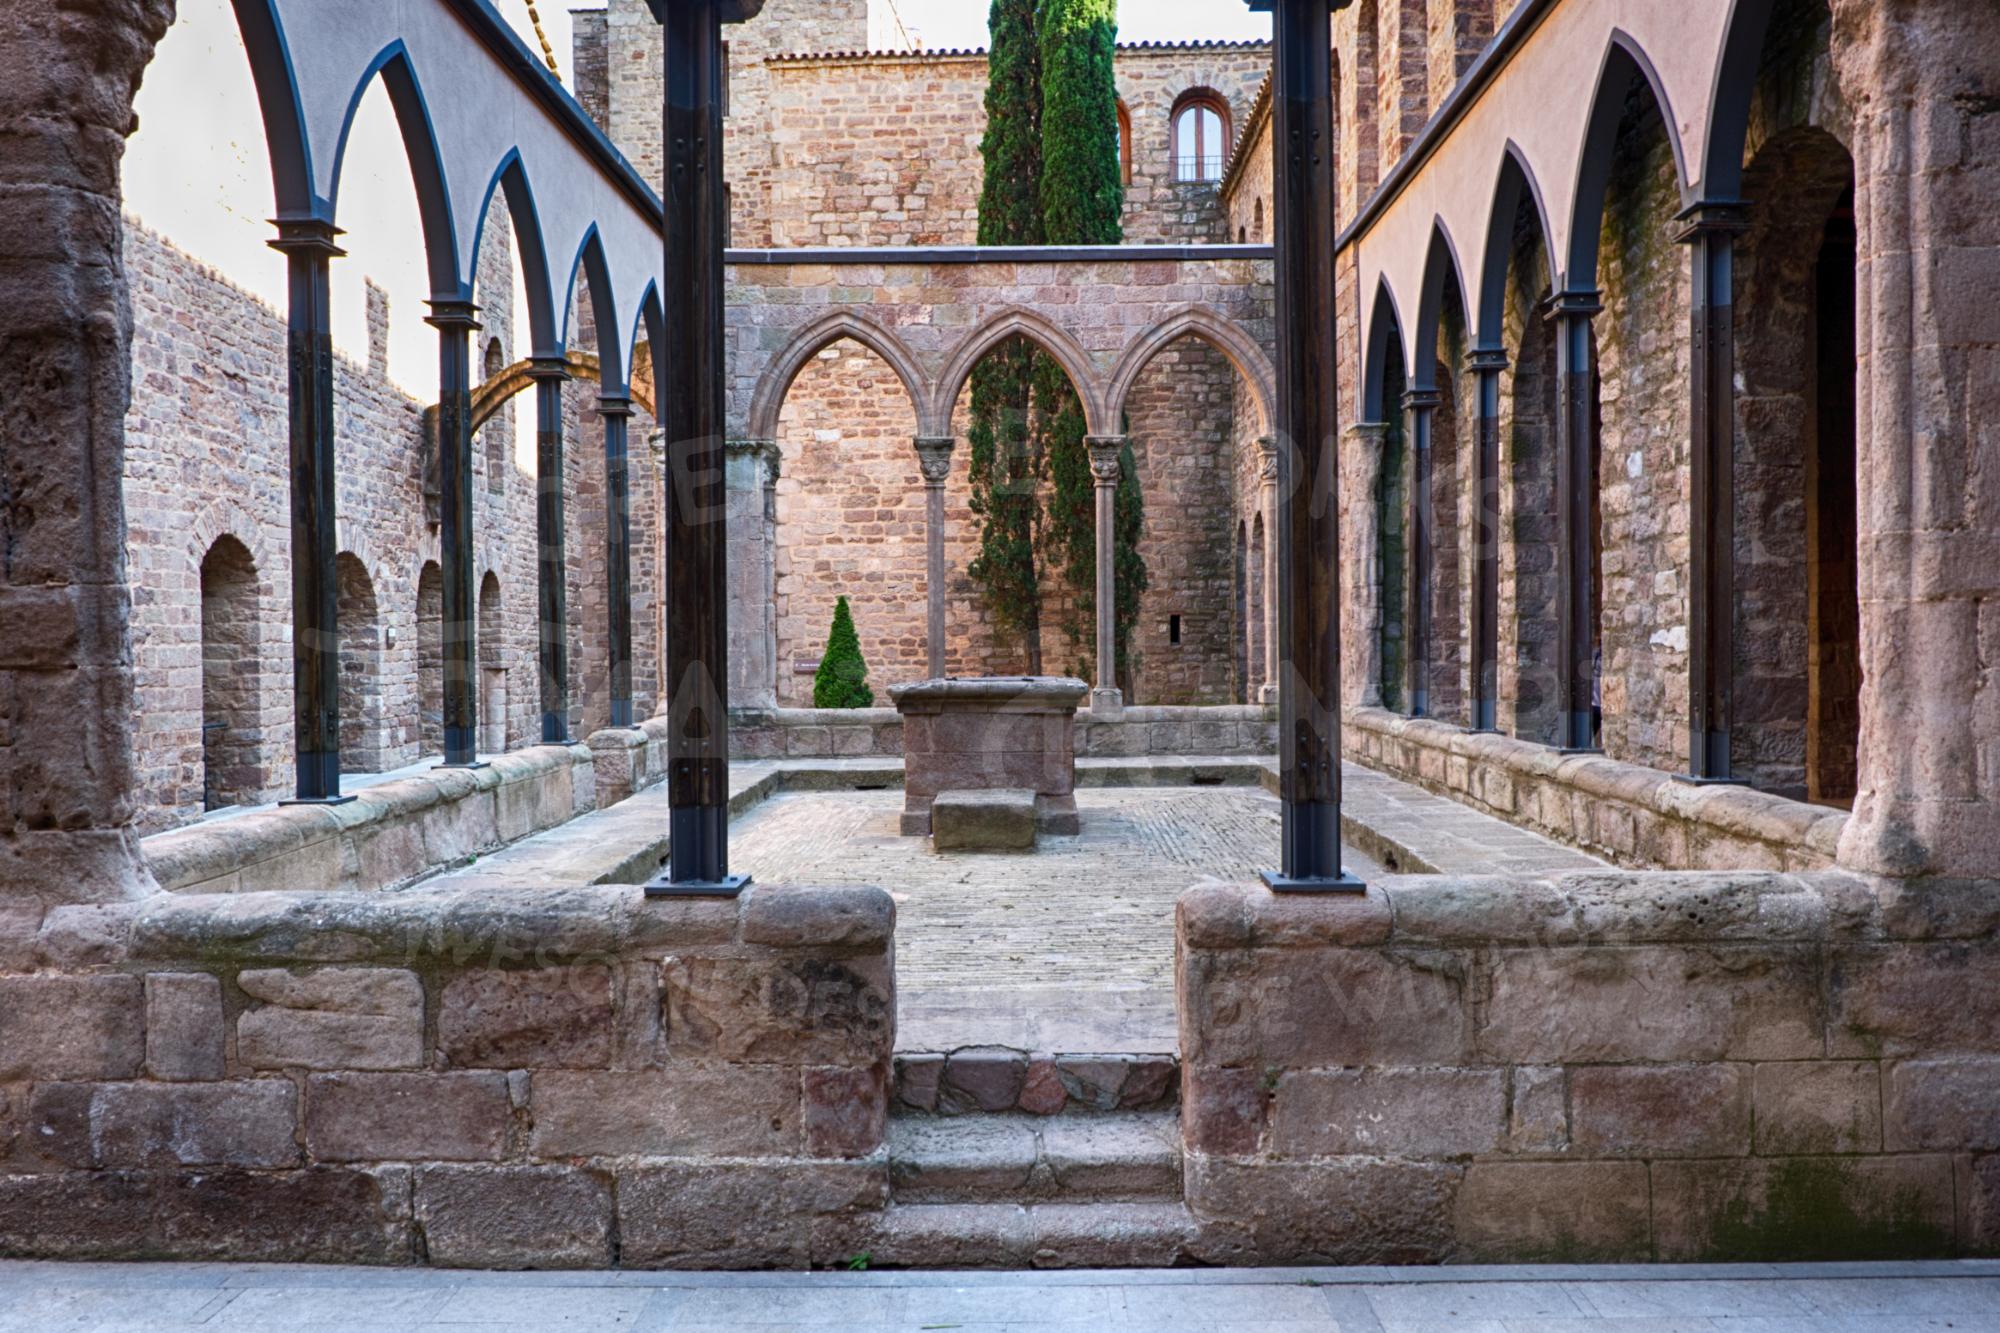 Inner Courtyard Of Cardona Castle 3- Photo example image 1